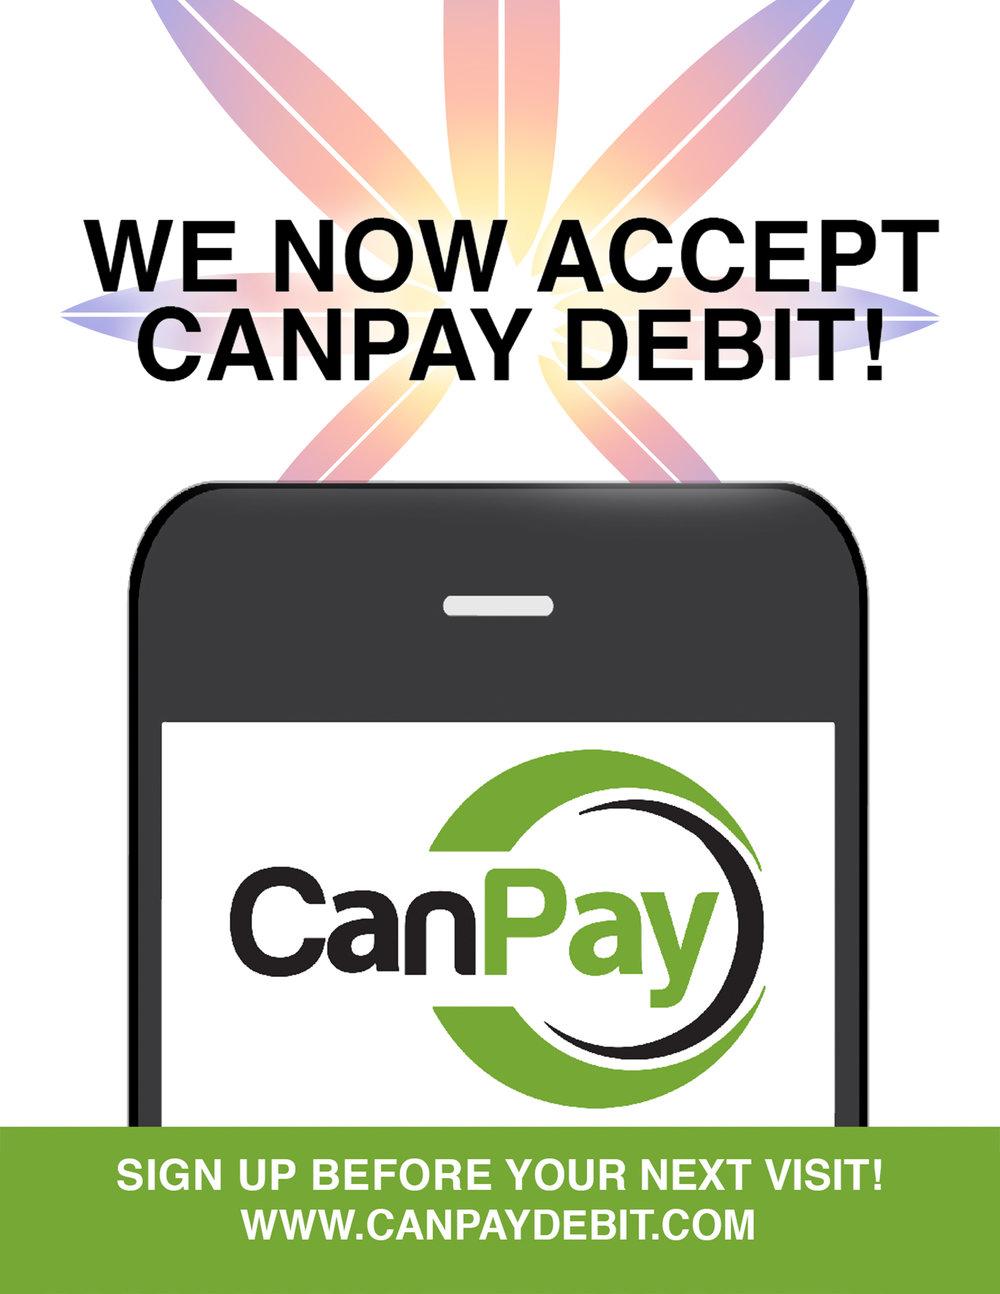 CanPay Debit Poster.jpg